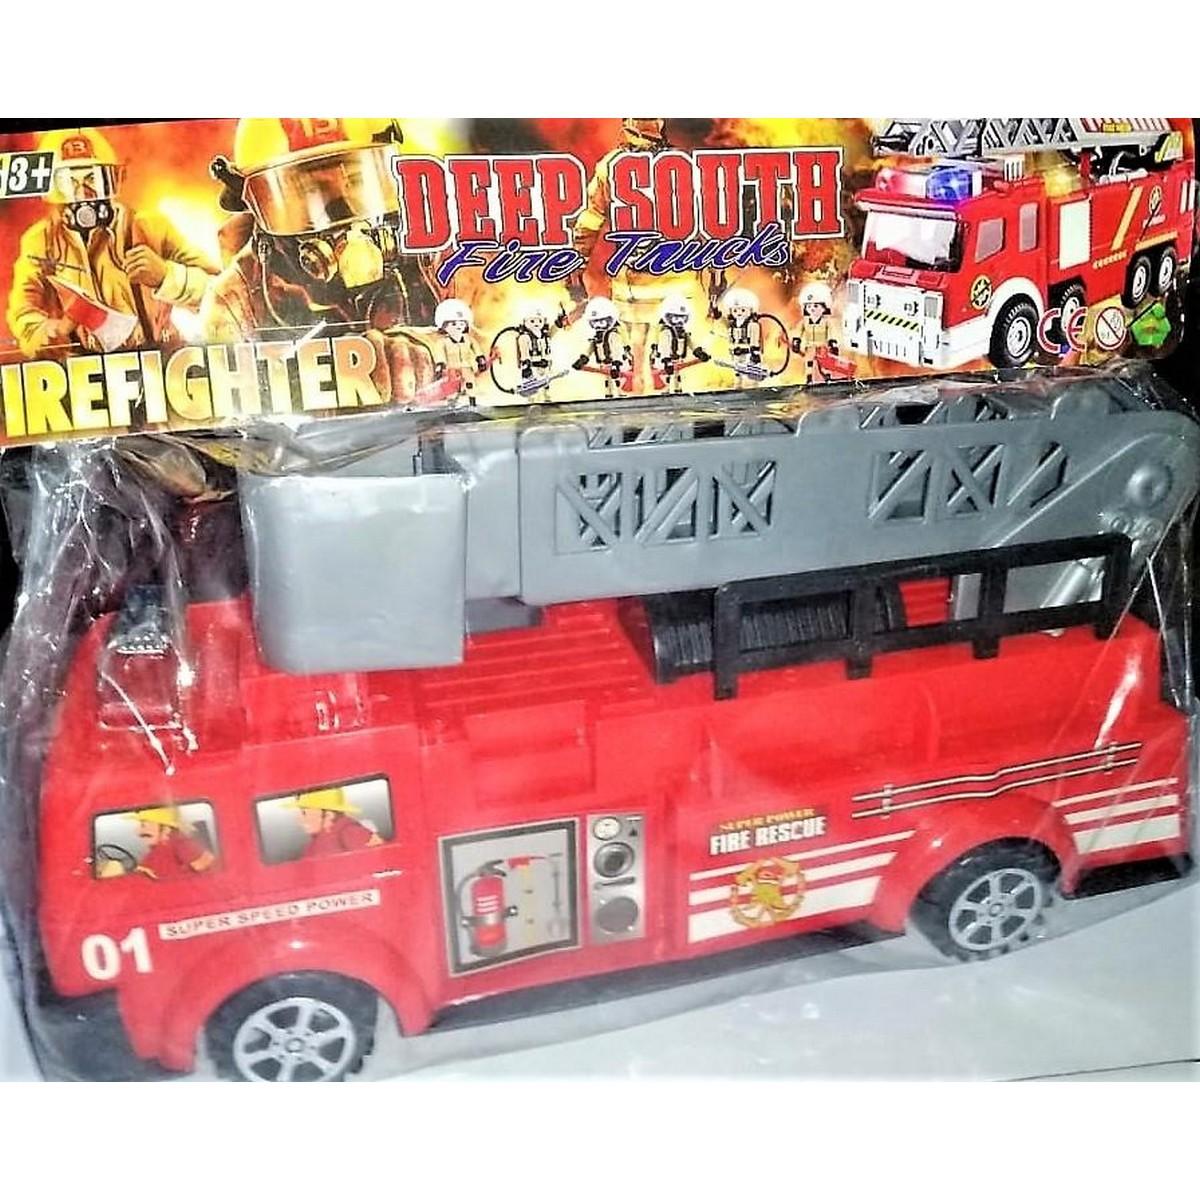 Fire Brigade Truck Fire Fighter Truck Red Color Attractive